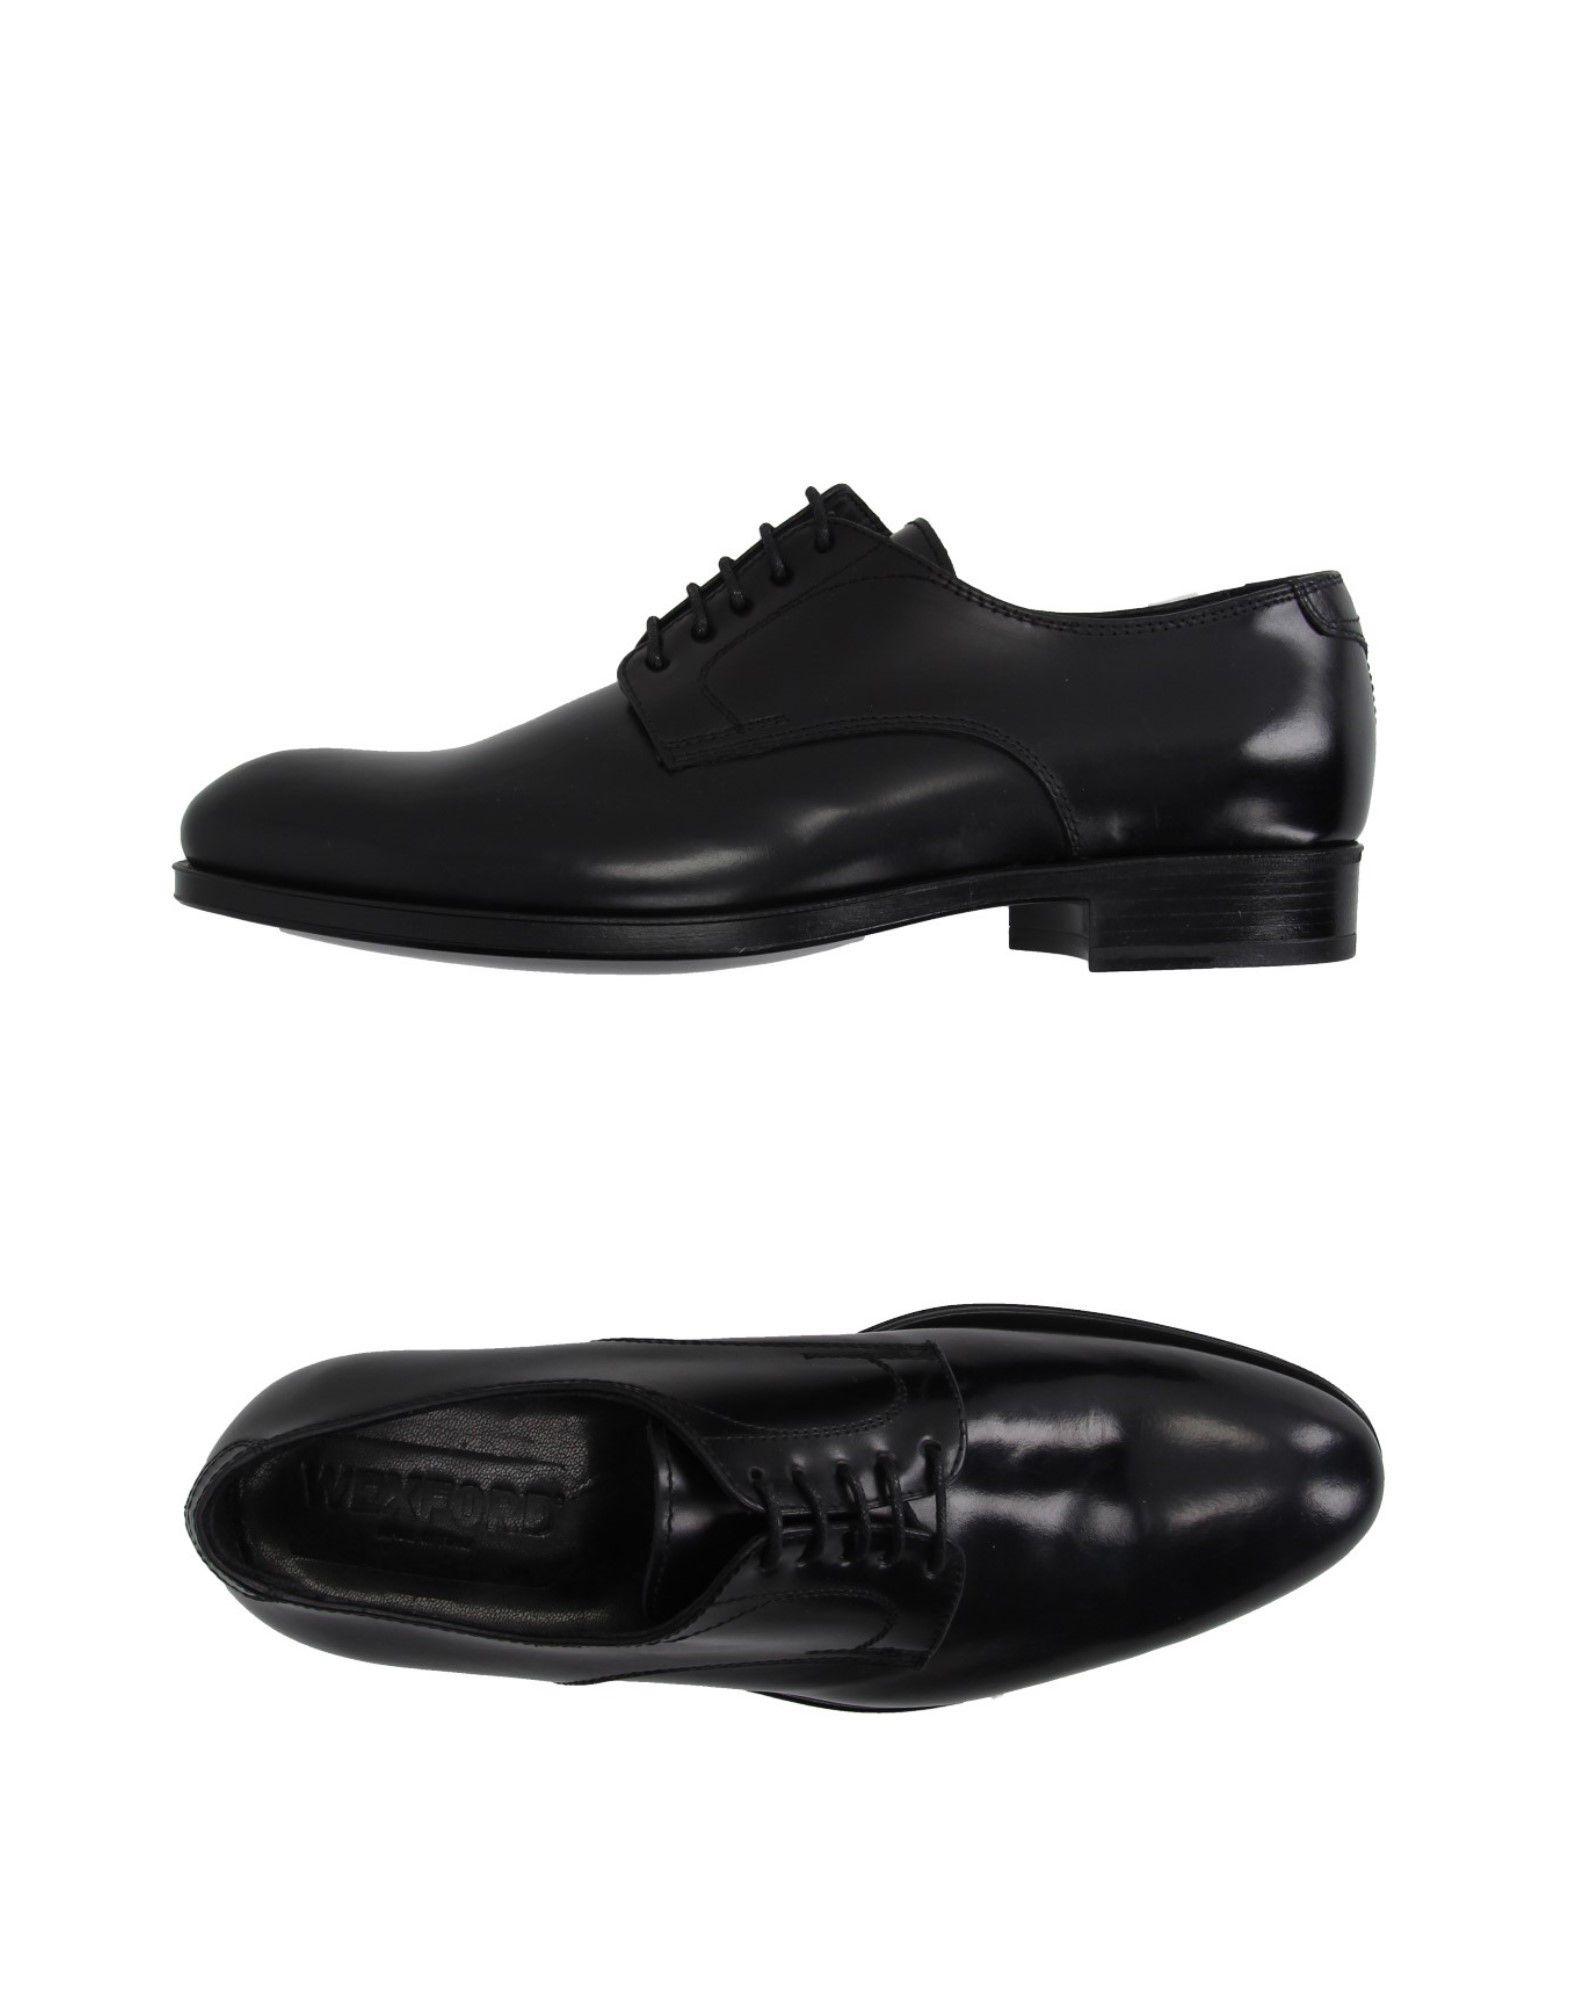 Rabatt echte Schuhe Wexford Schnürschuhe Herren  11015747RN